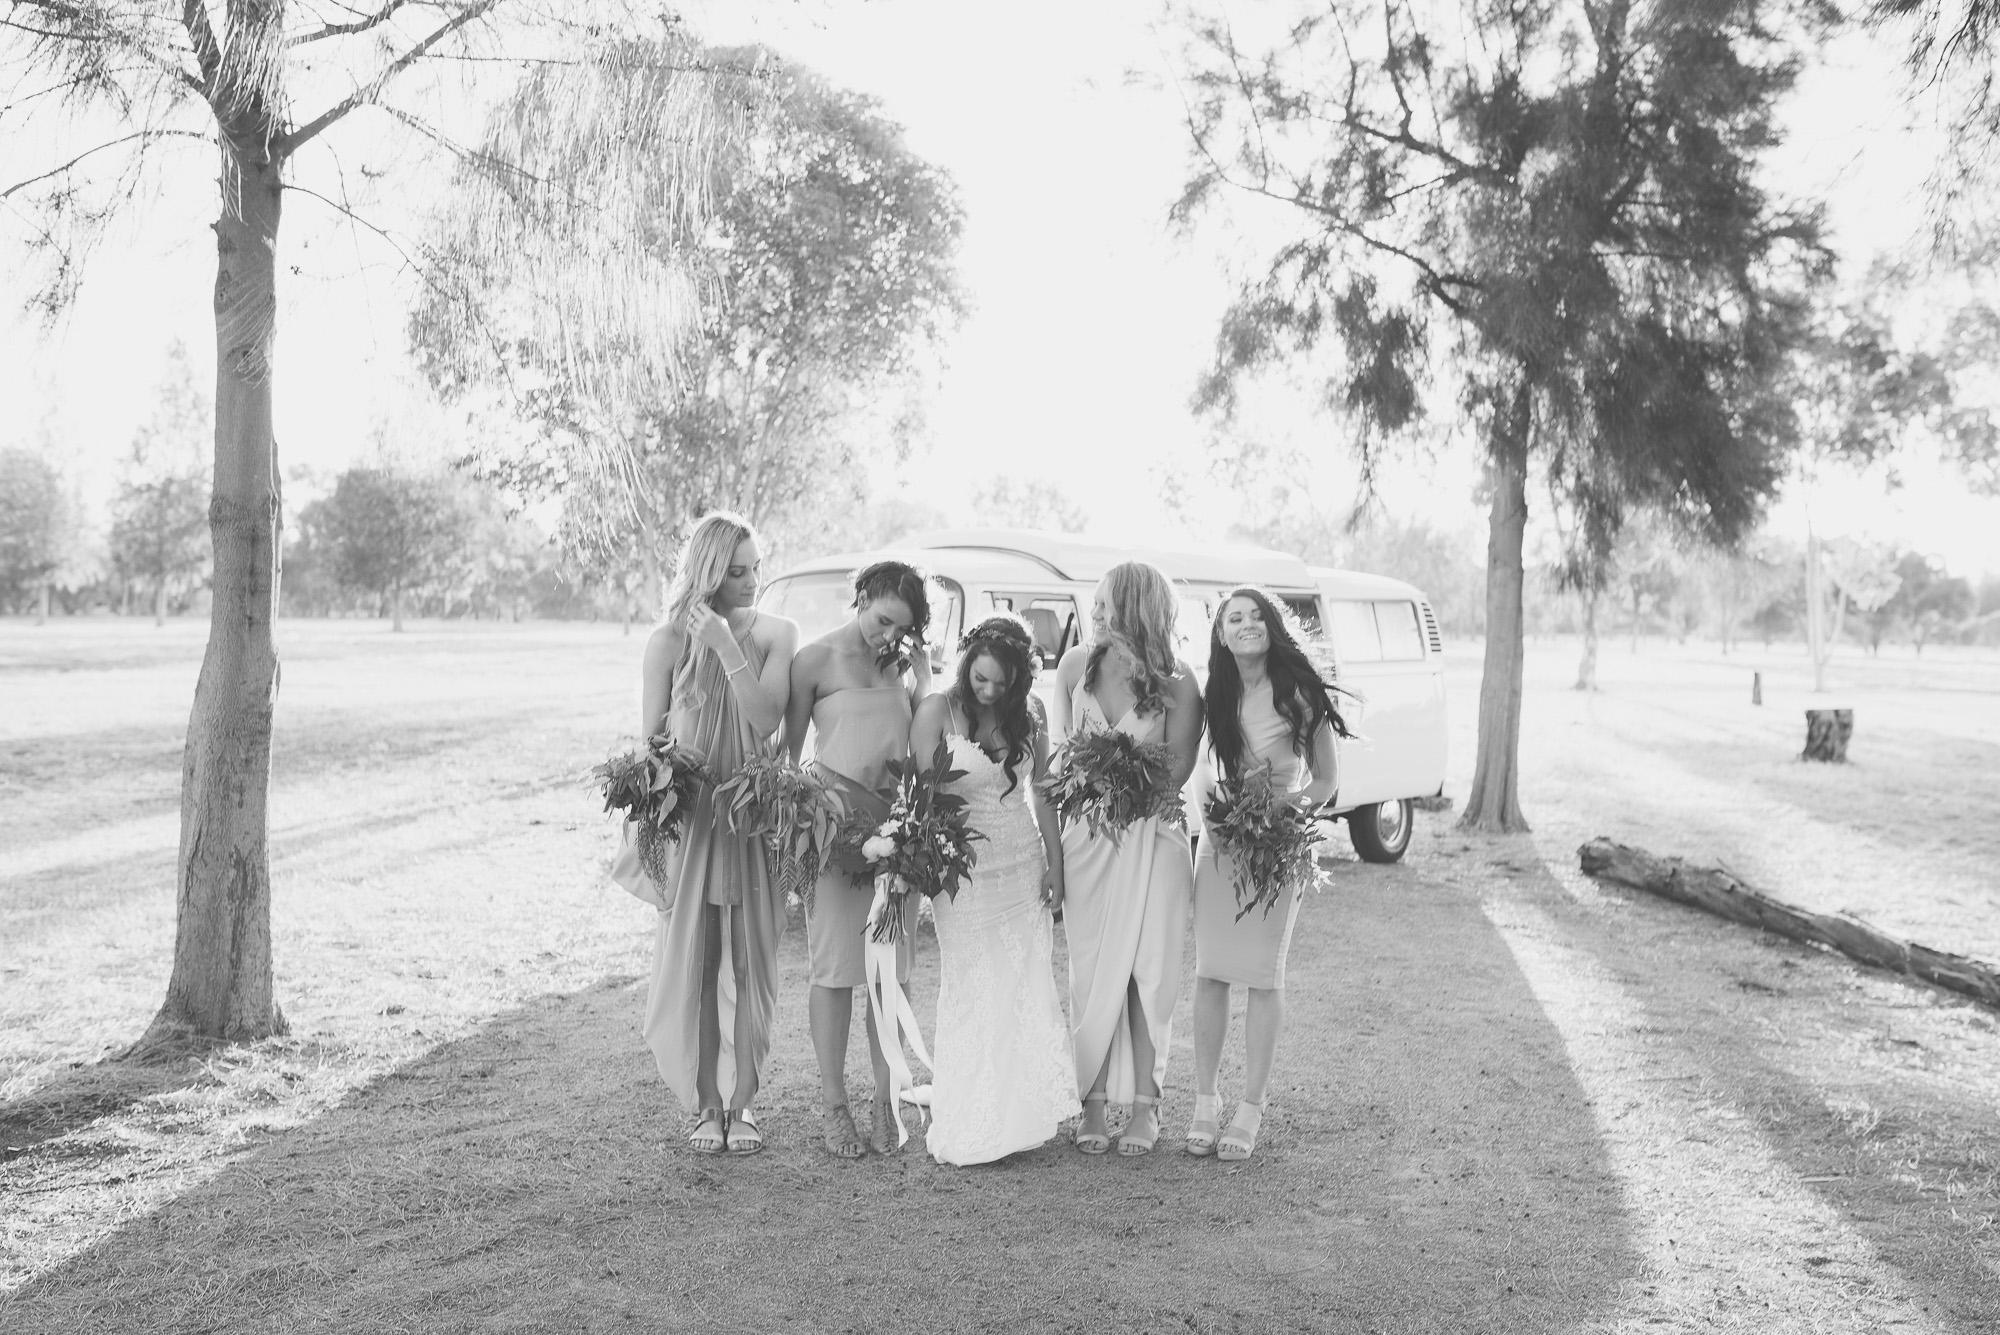 wedding-photographer-outdoor-casual-styled-los-angeles-australia-california-international-earthbound -58.jpg